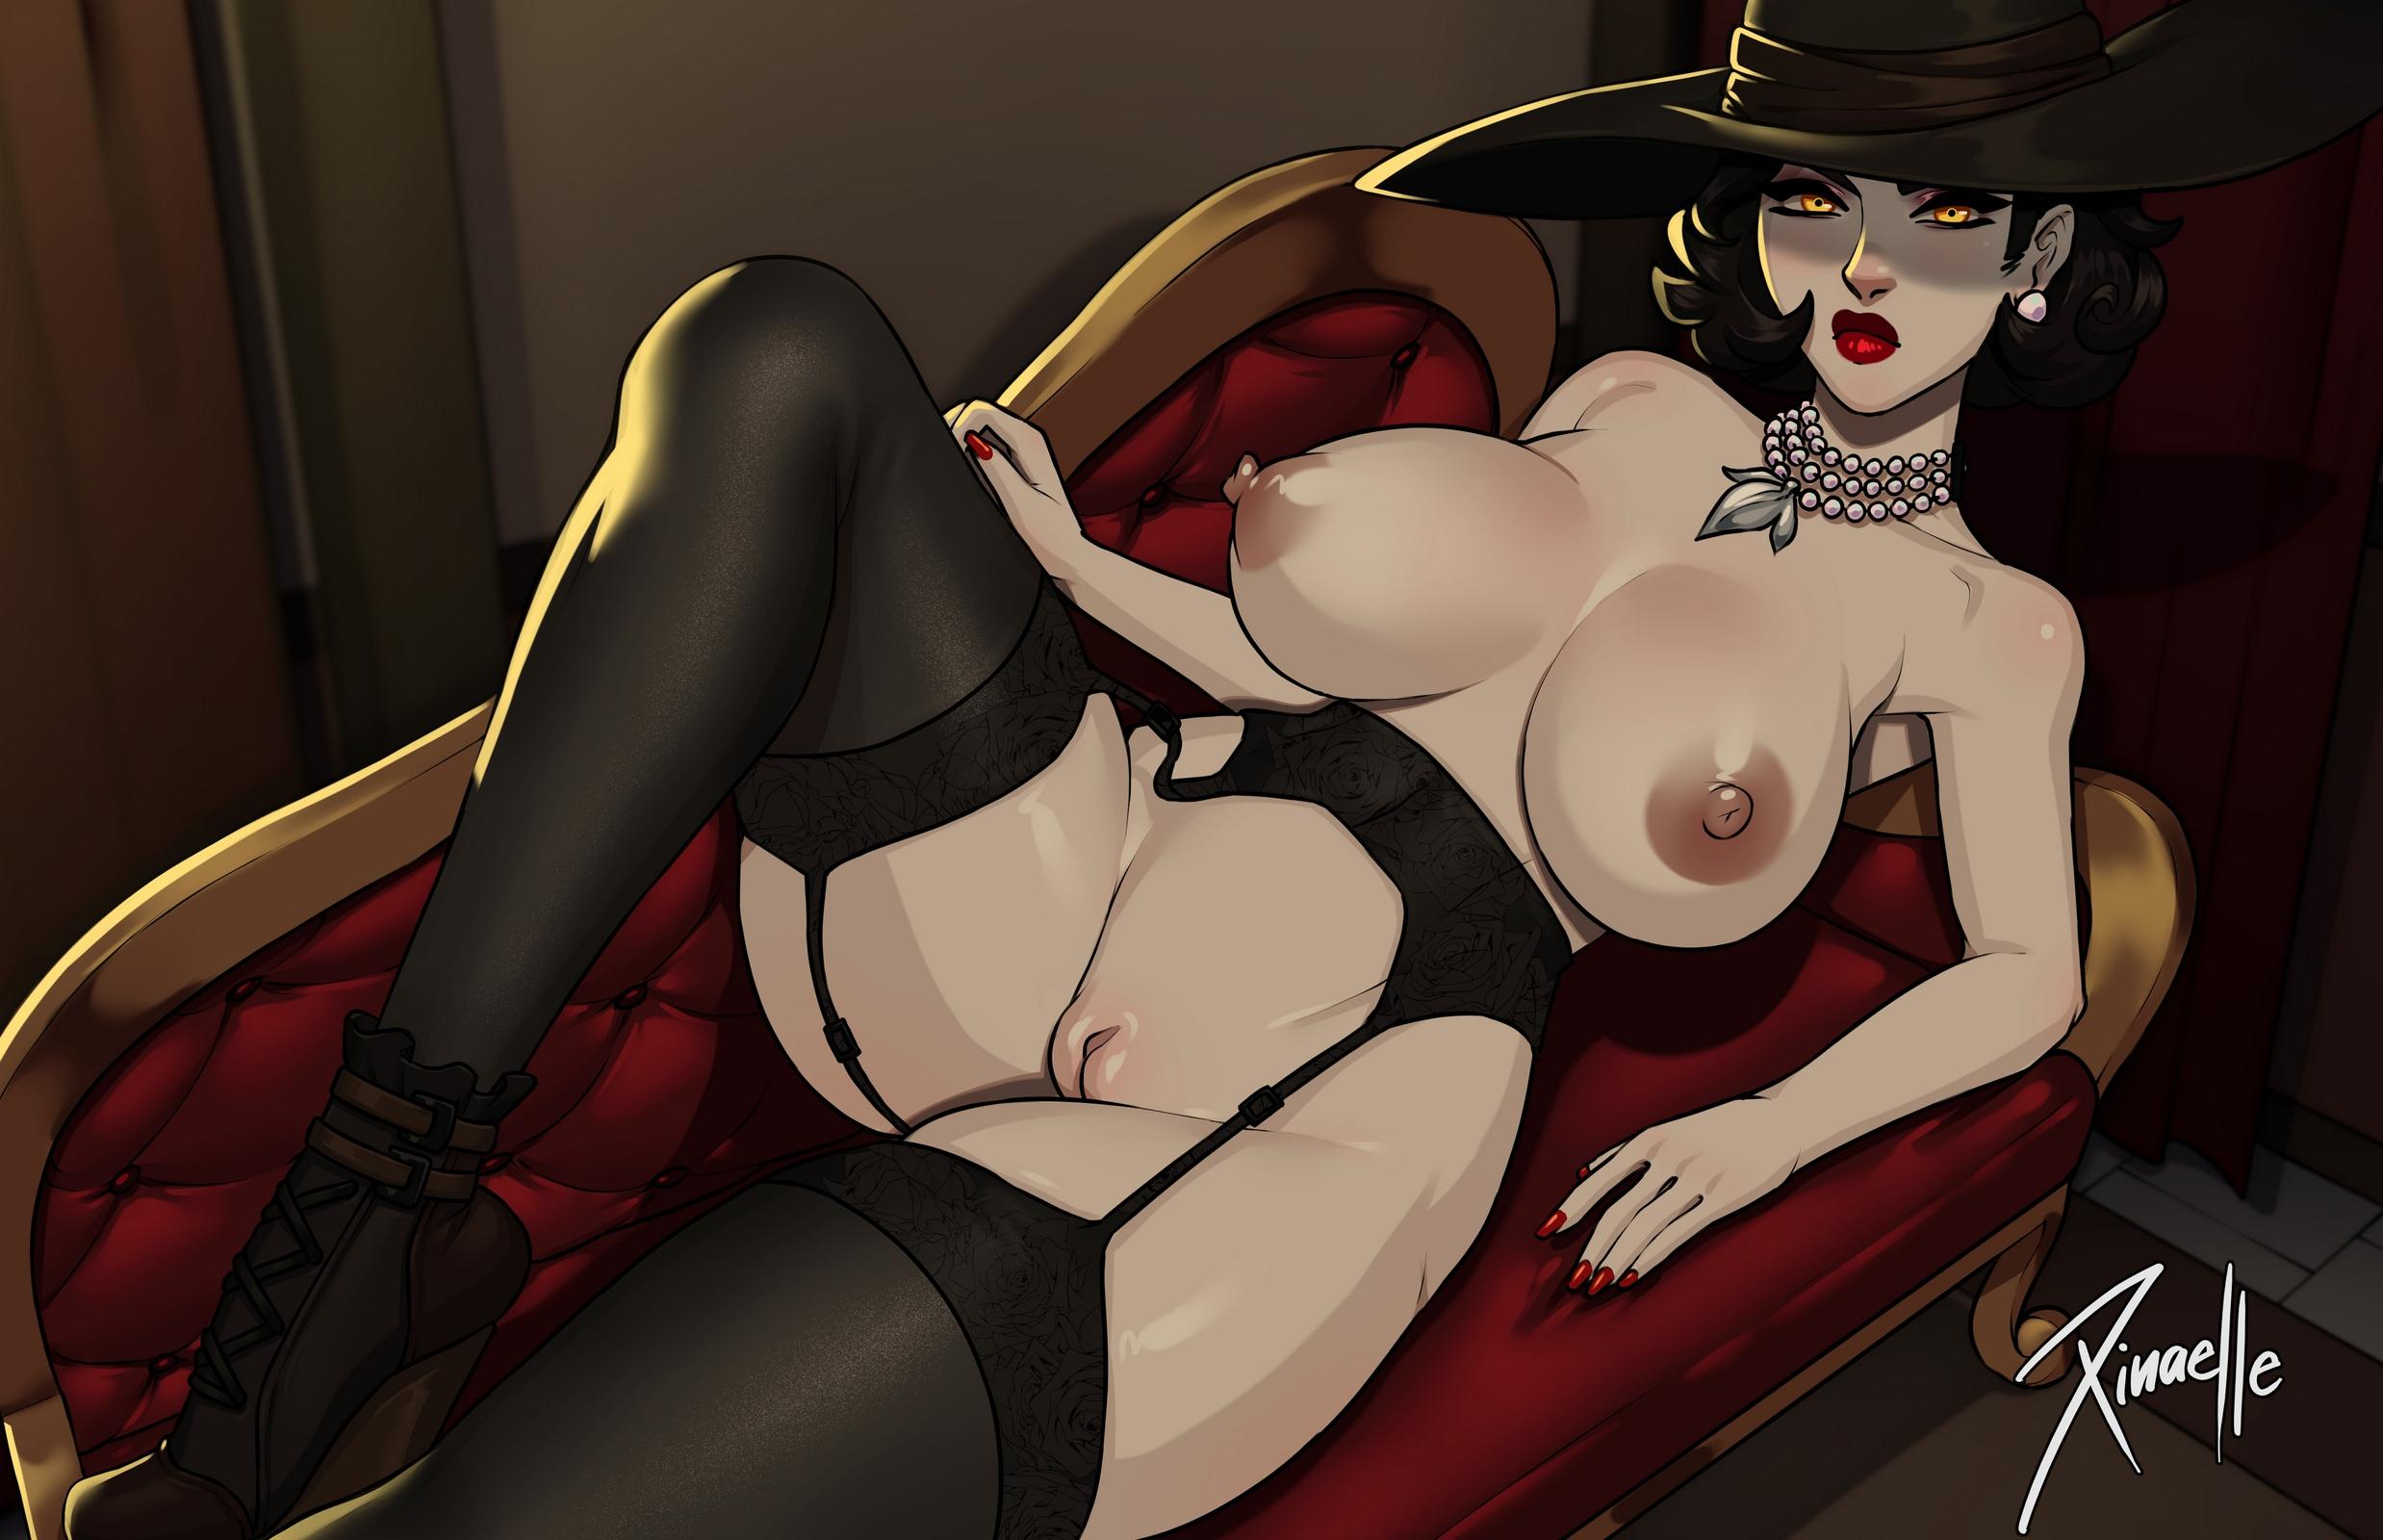 Xinaelle - Alcina Dimitrescu Big Vampire Lady hentai porn 1